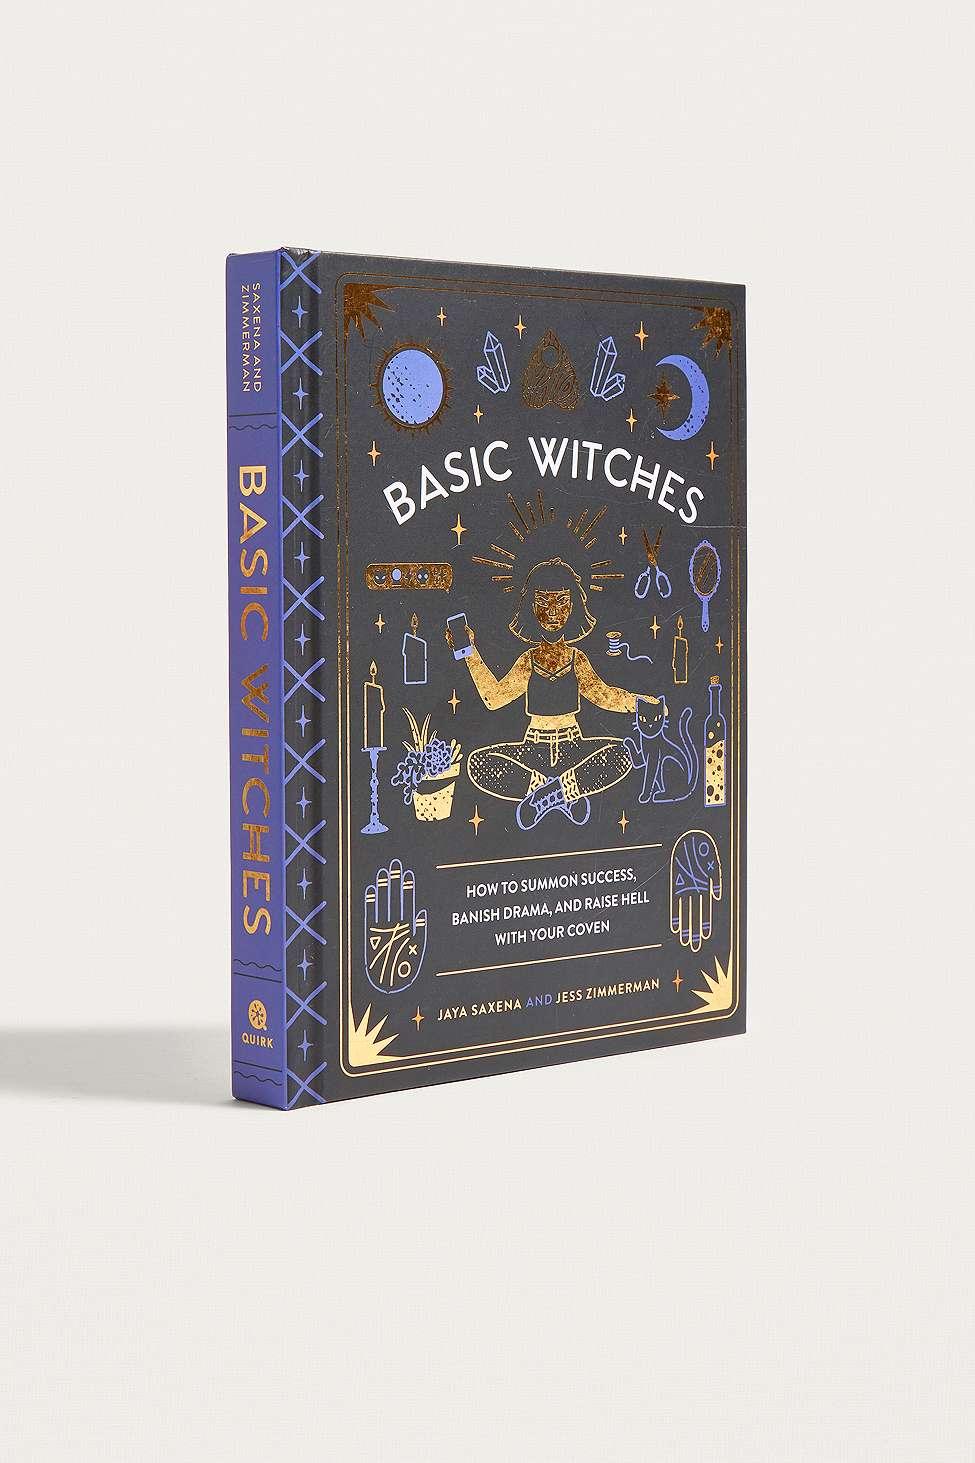 Slide View: 1: Basic Witches By Jaya Saxena & Jess Zimmerman